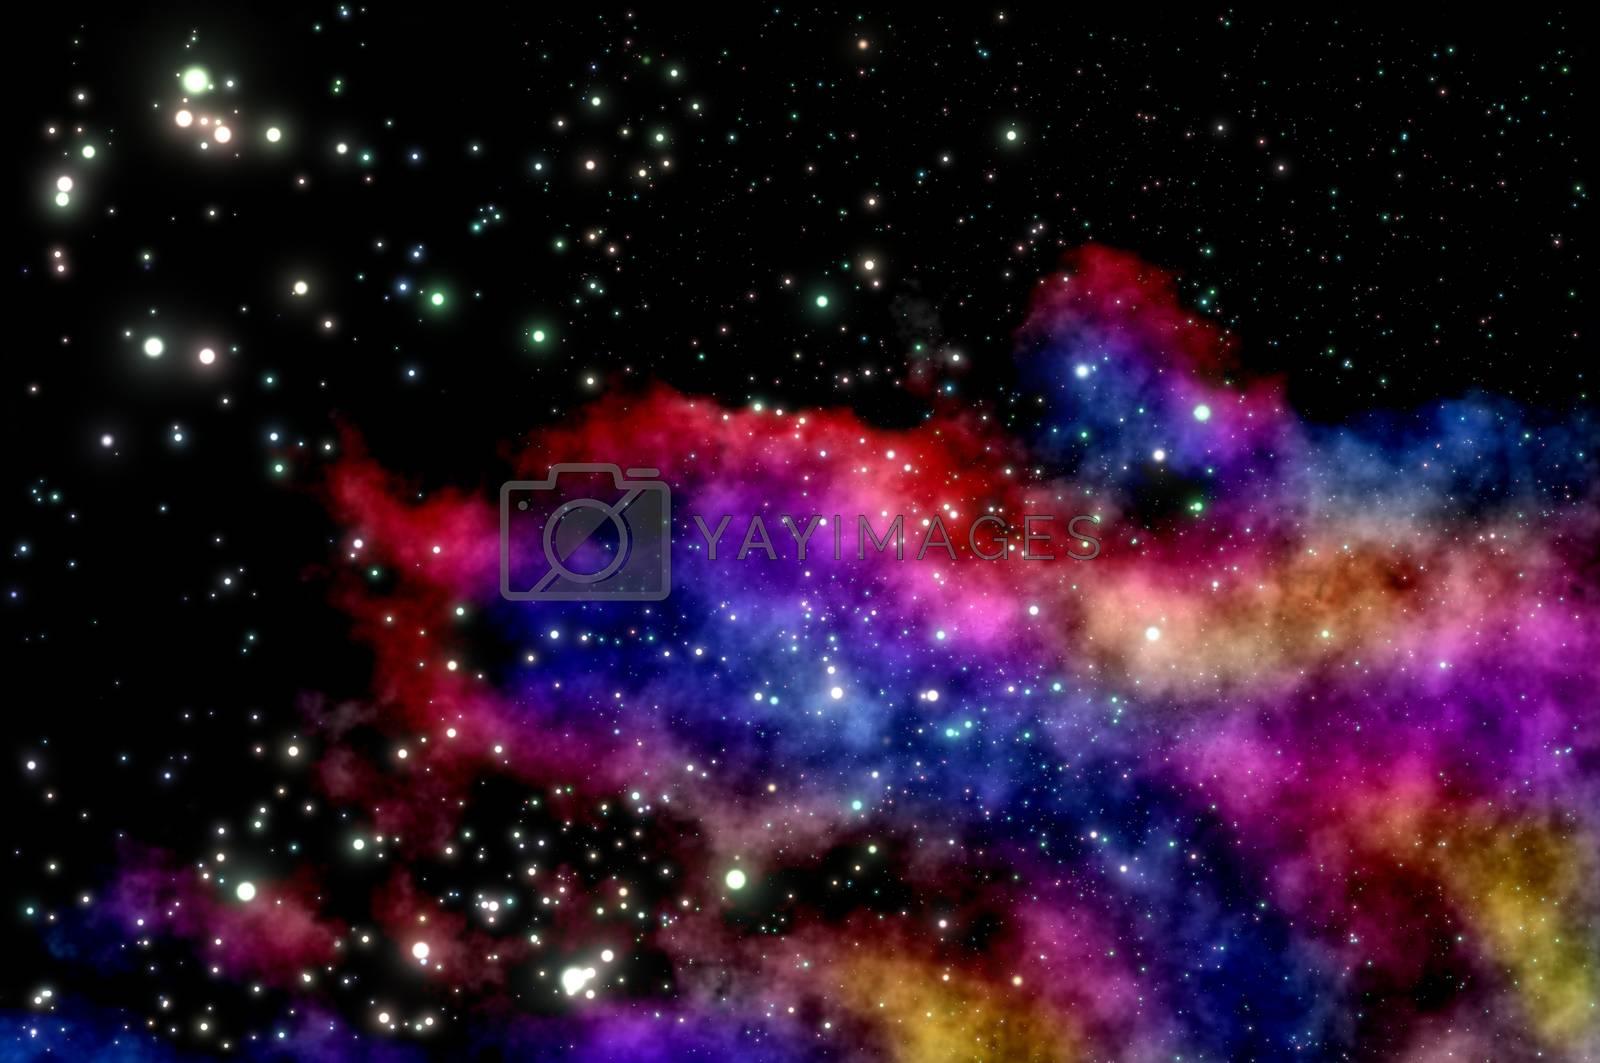 stars shine through the clouds of a new nebula